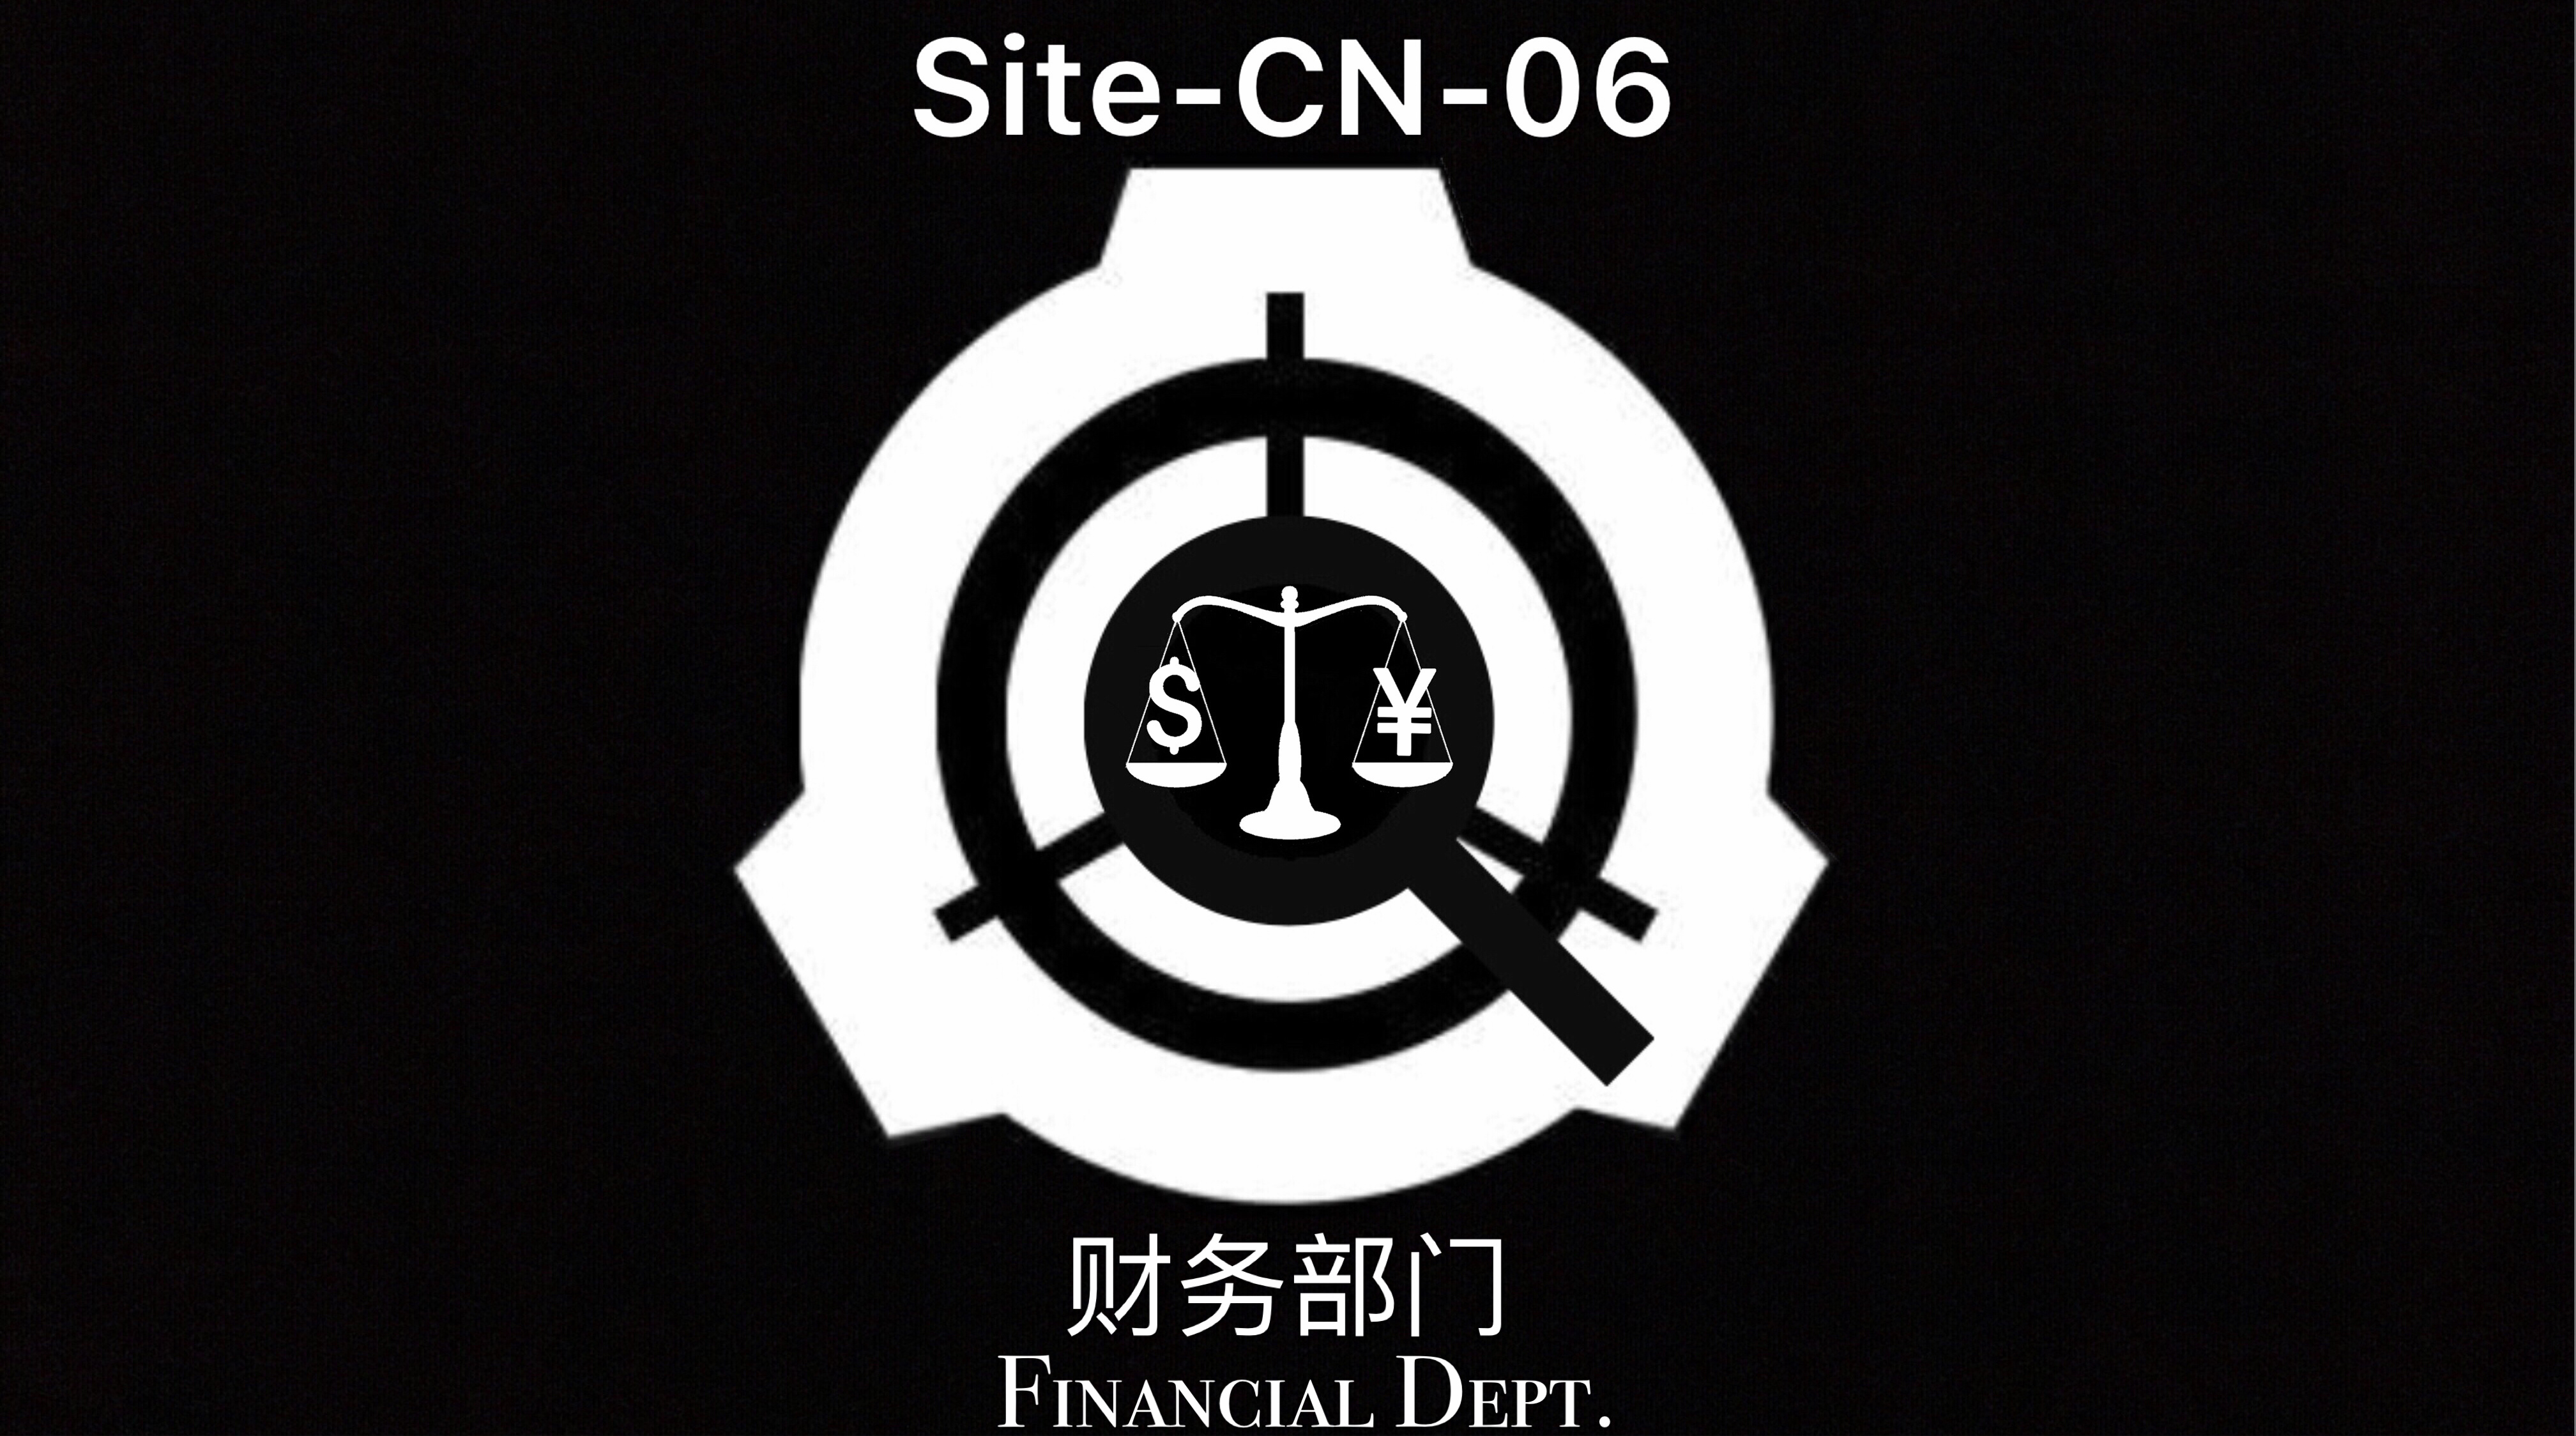 CY37r9.jpg